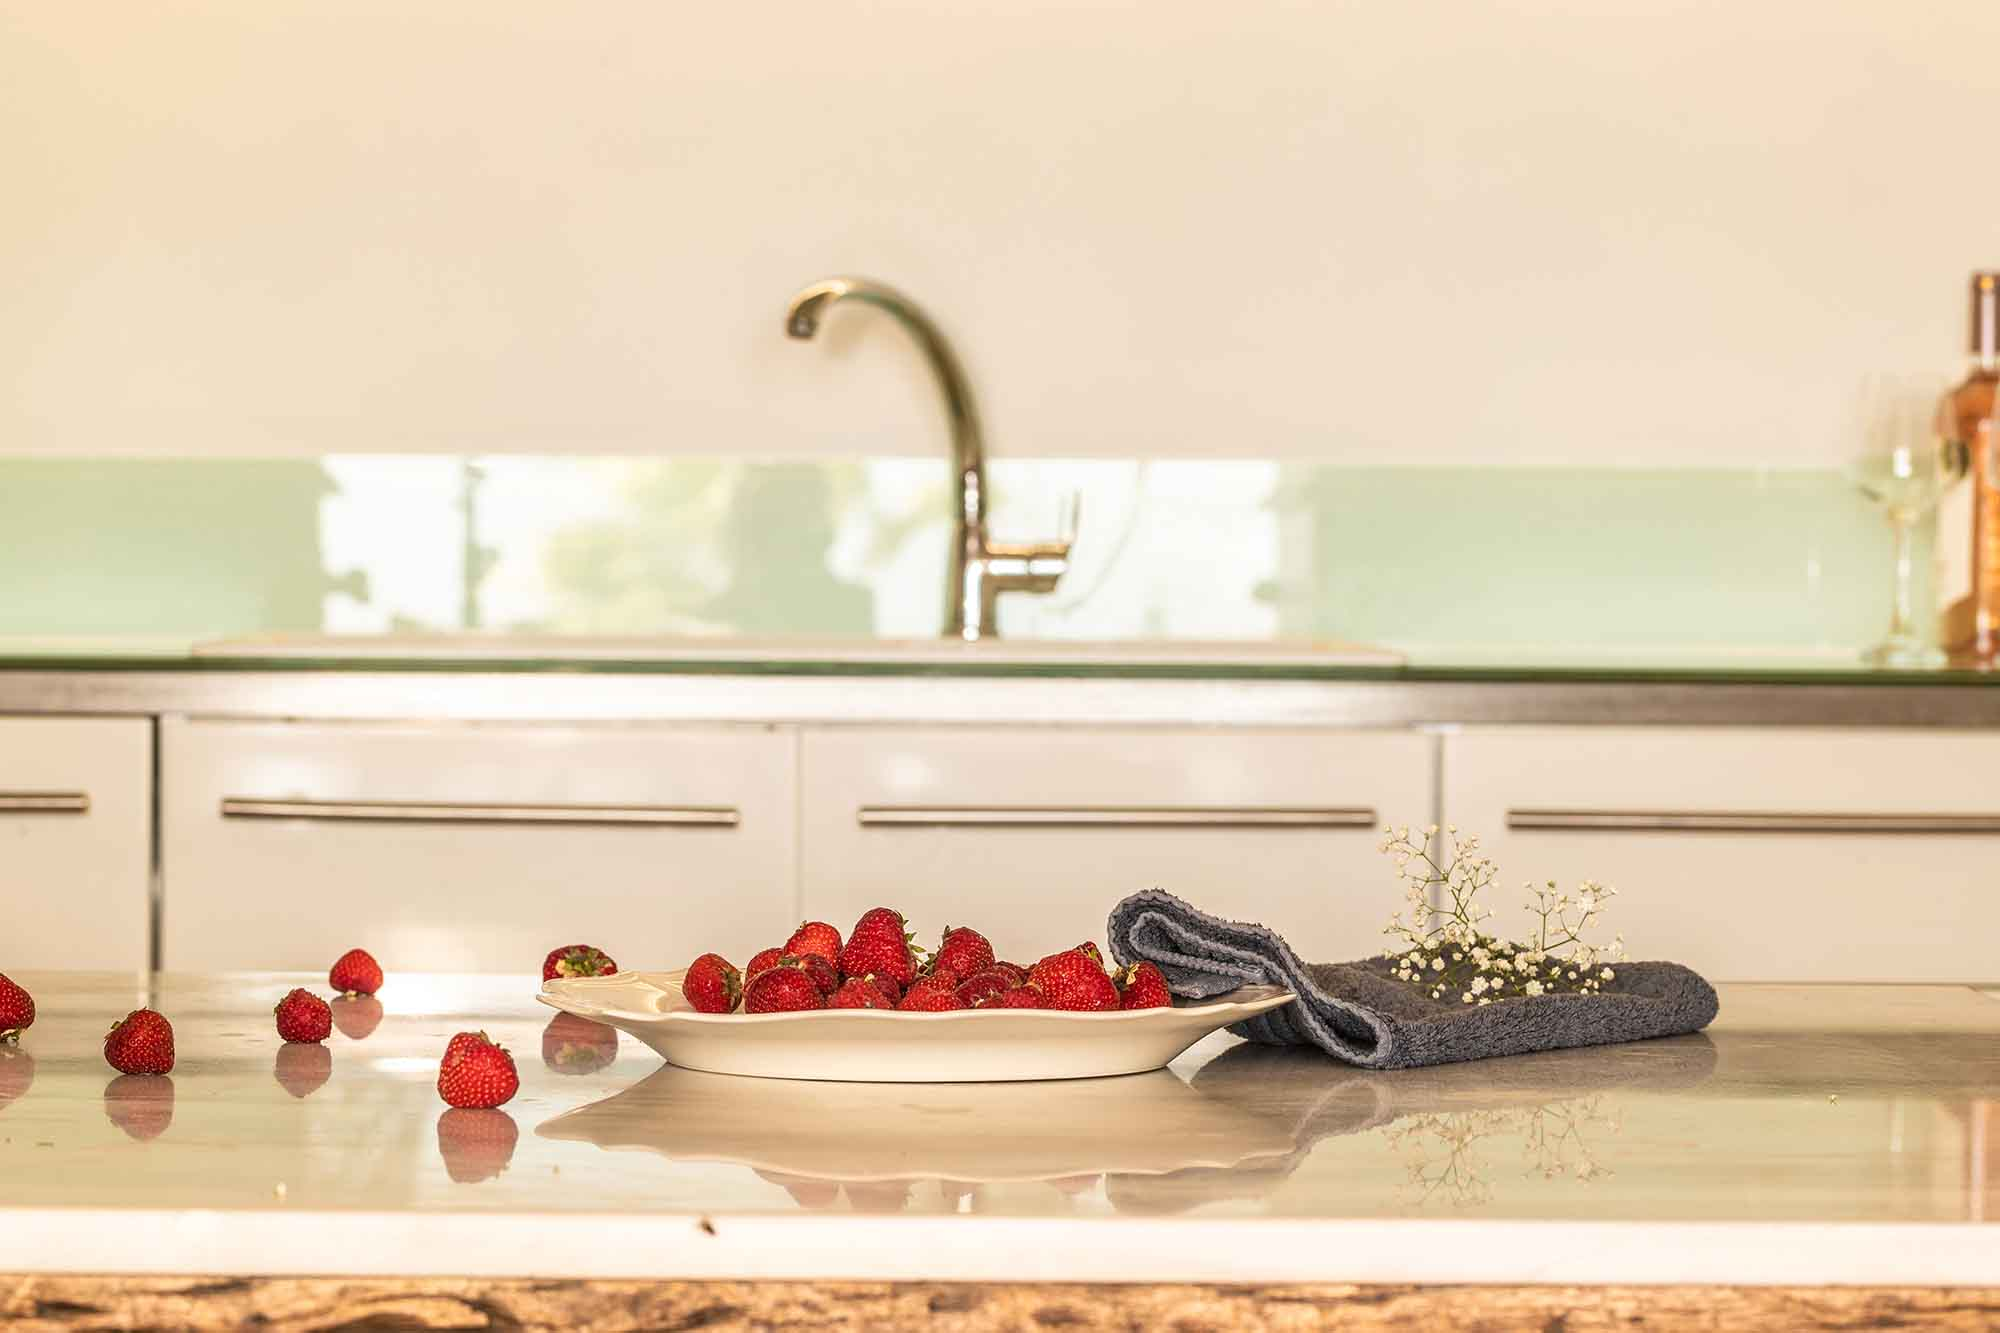 RENT A LUXURIOUS VILLA BY THE SEA IN MYKONOS - VILLA KARKOS - strawberry cuisine